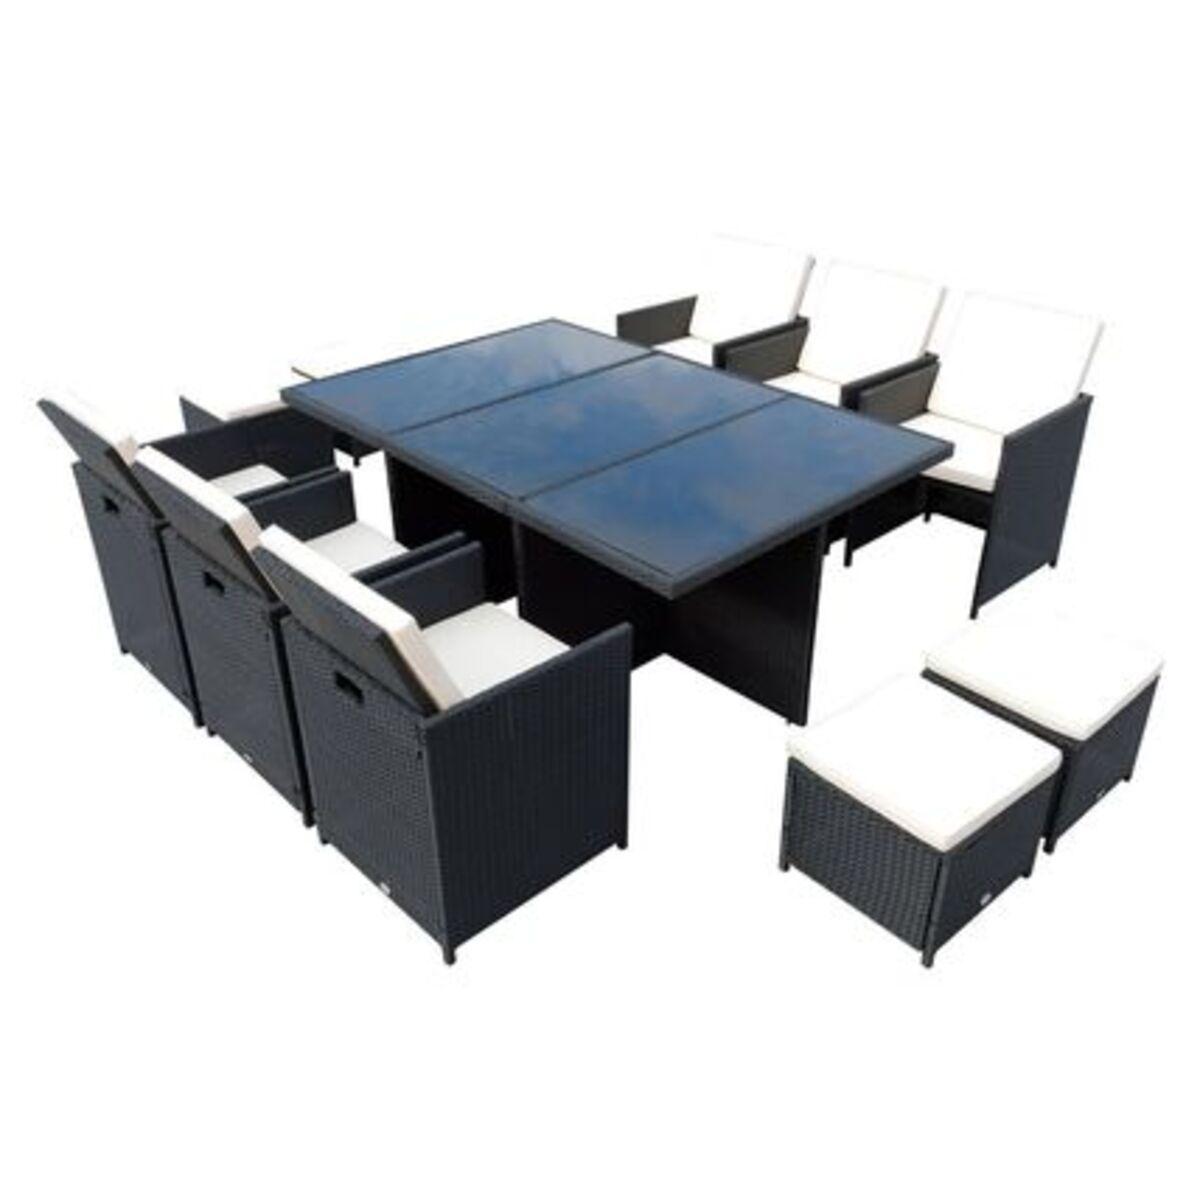 Bild 1 von Outsunny Polyrattan Sitzgruppe als 27-tlg. Set